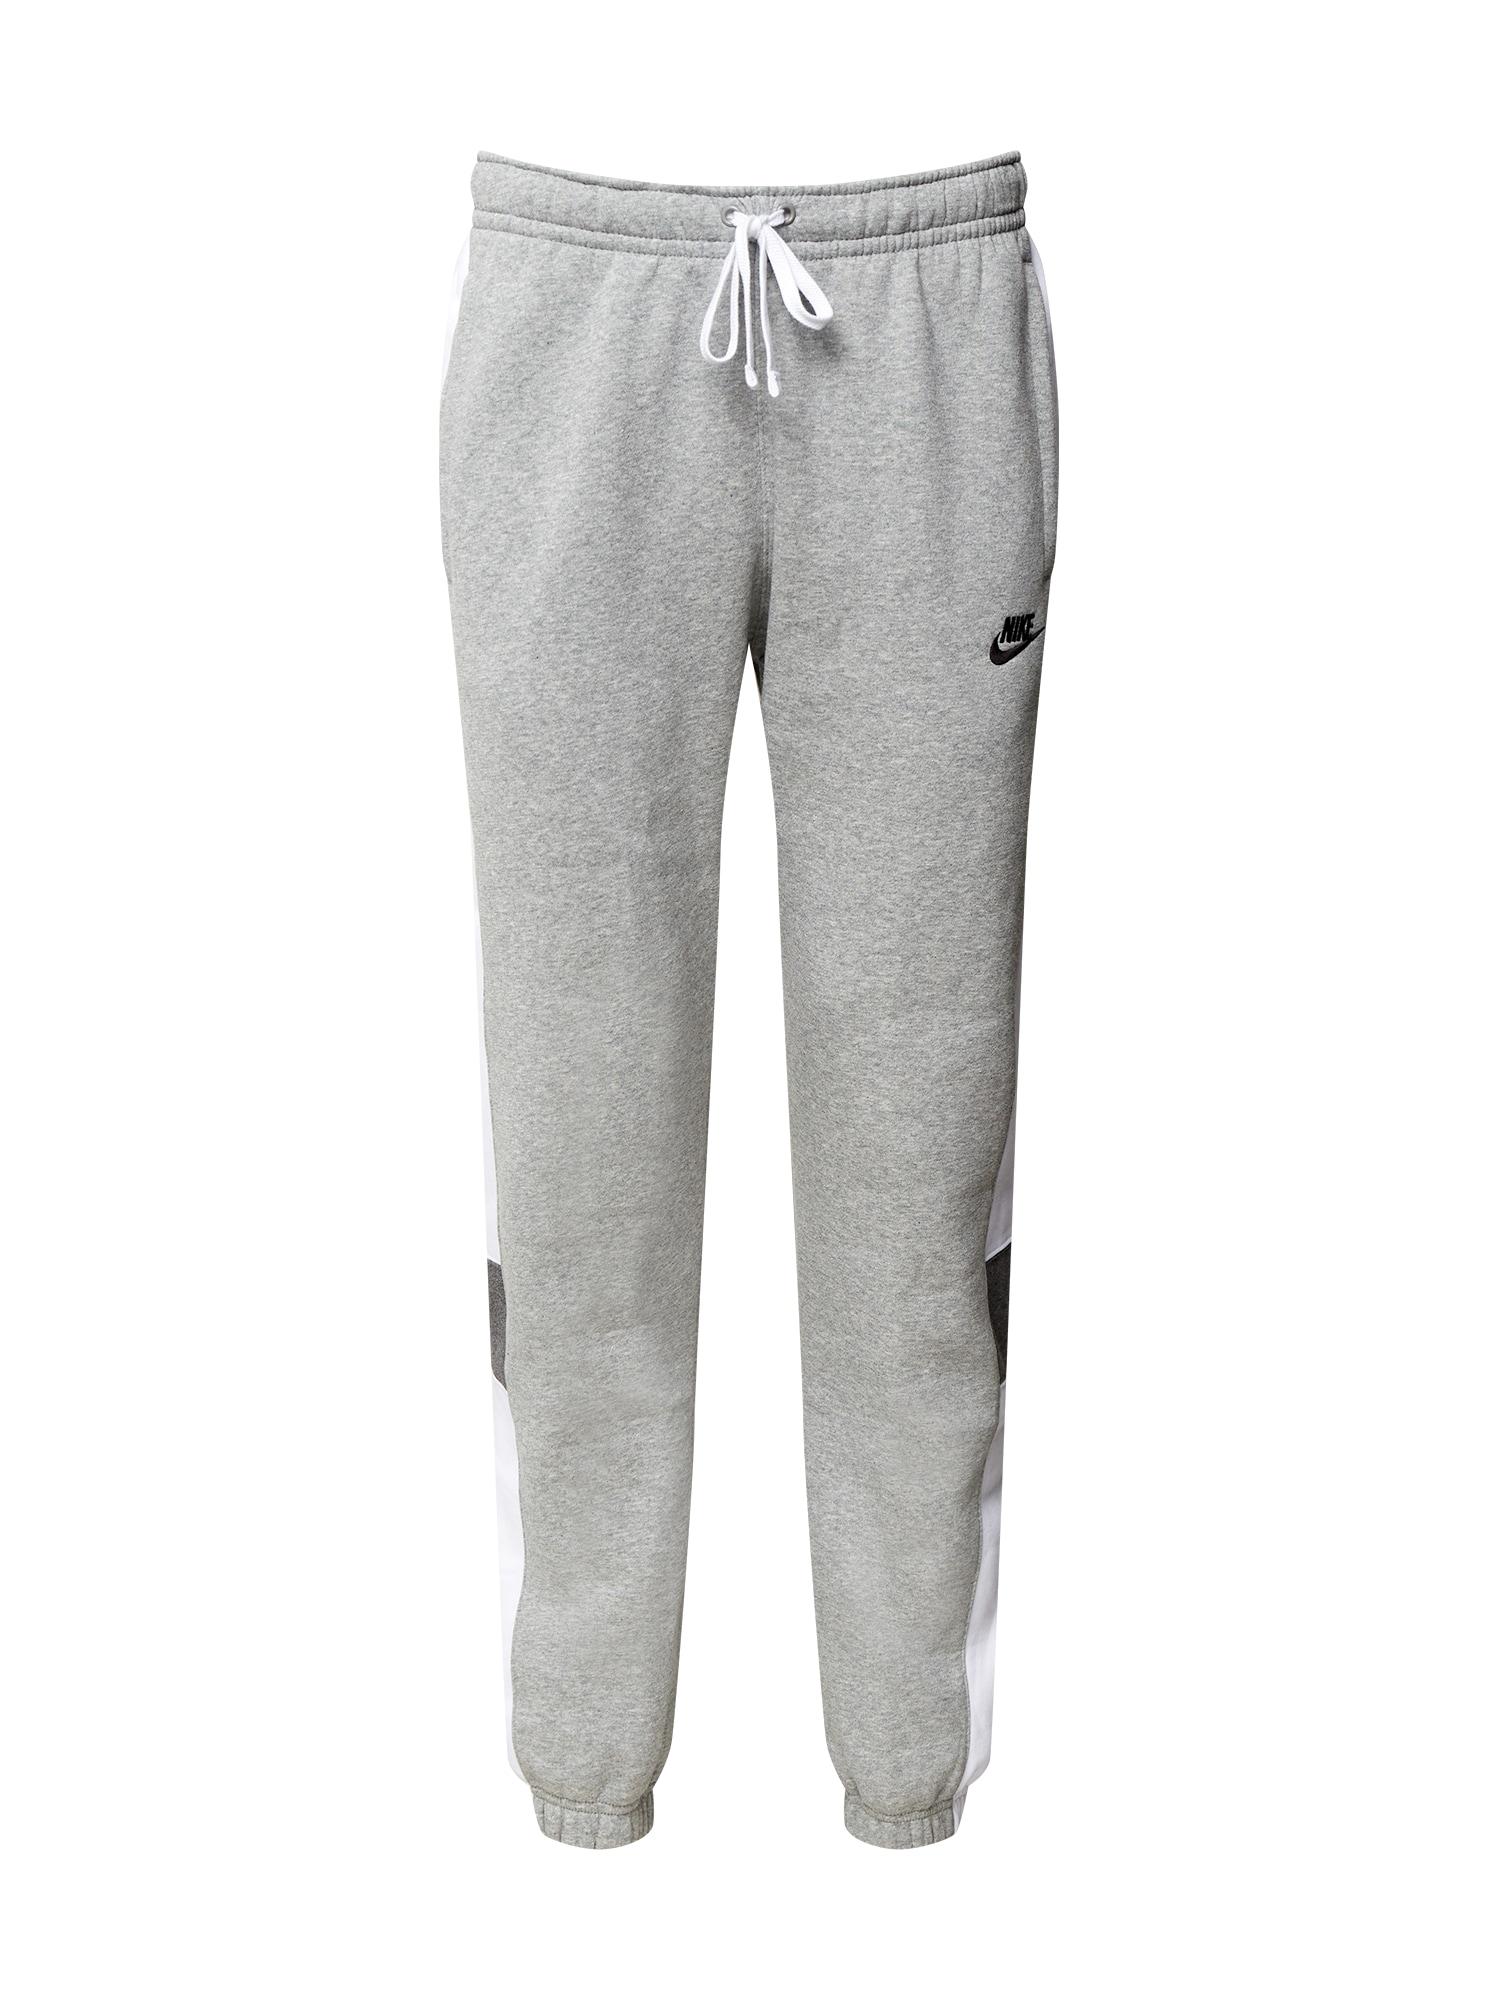 Nike Sportswear Kalhoty  šedý melír / bílá / černá